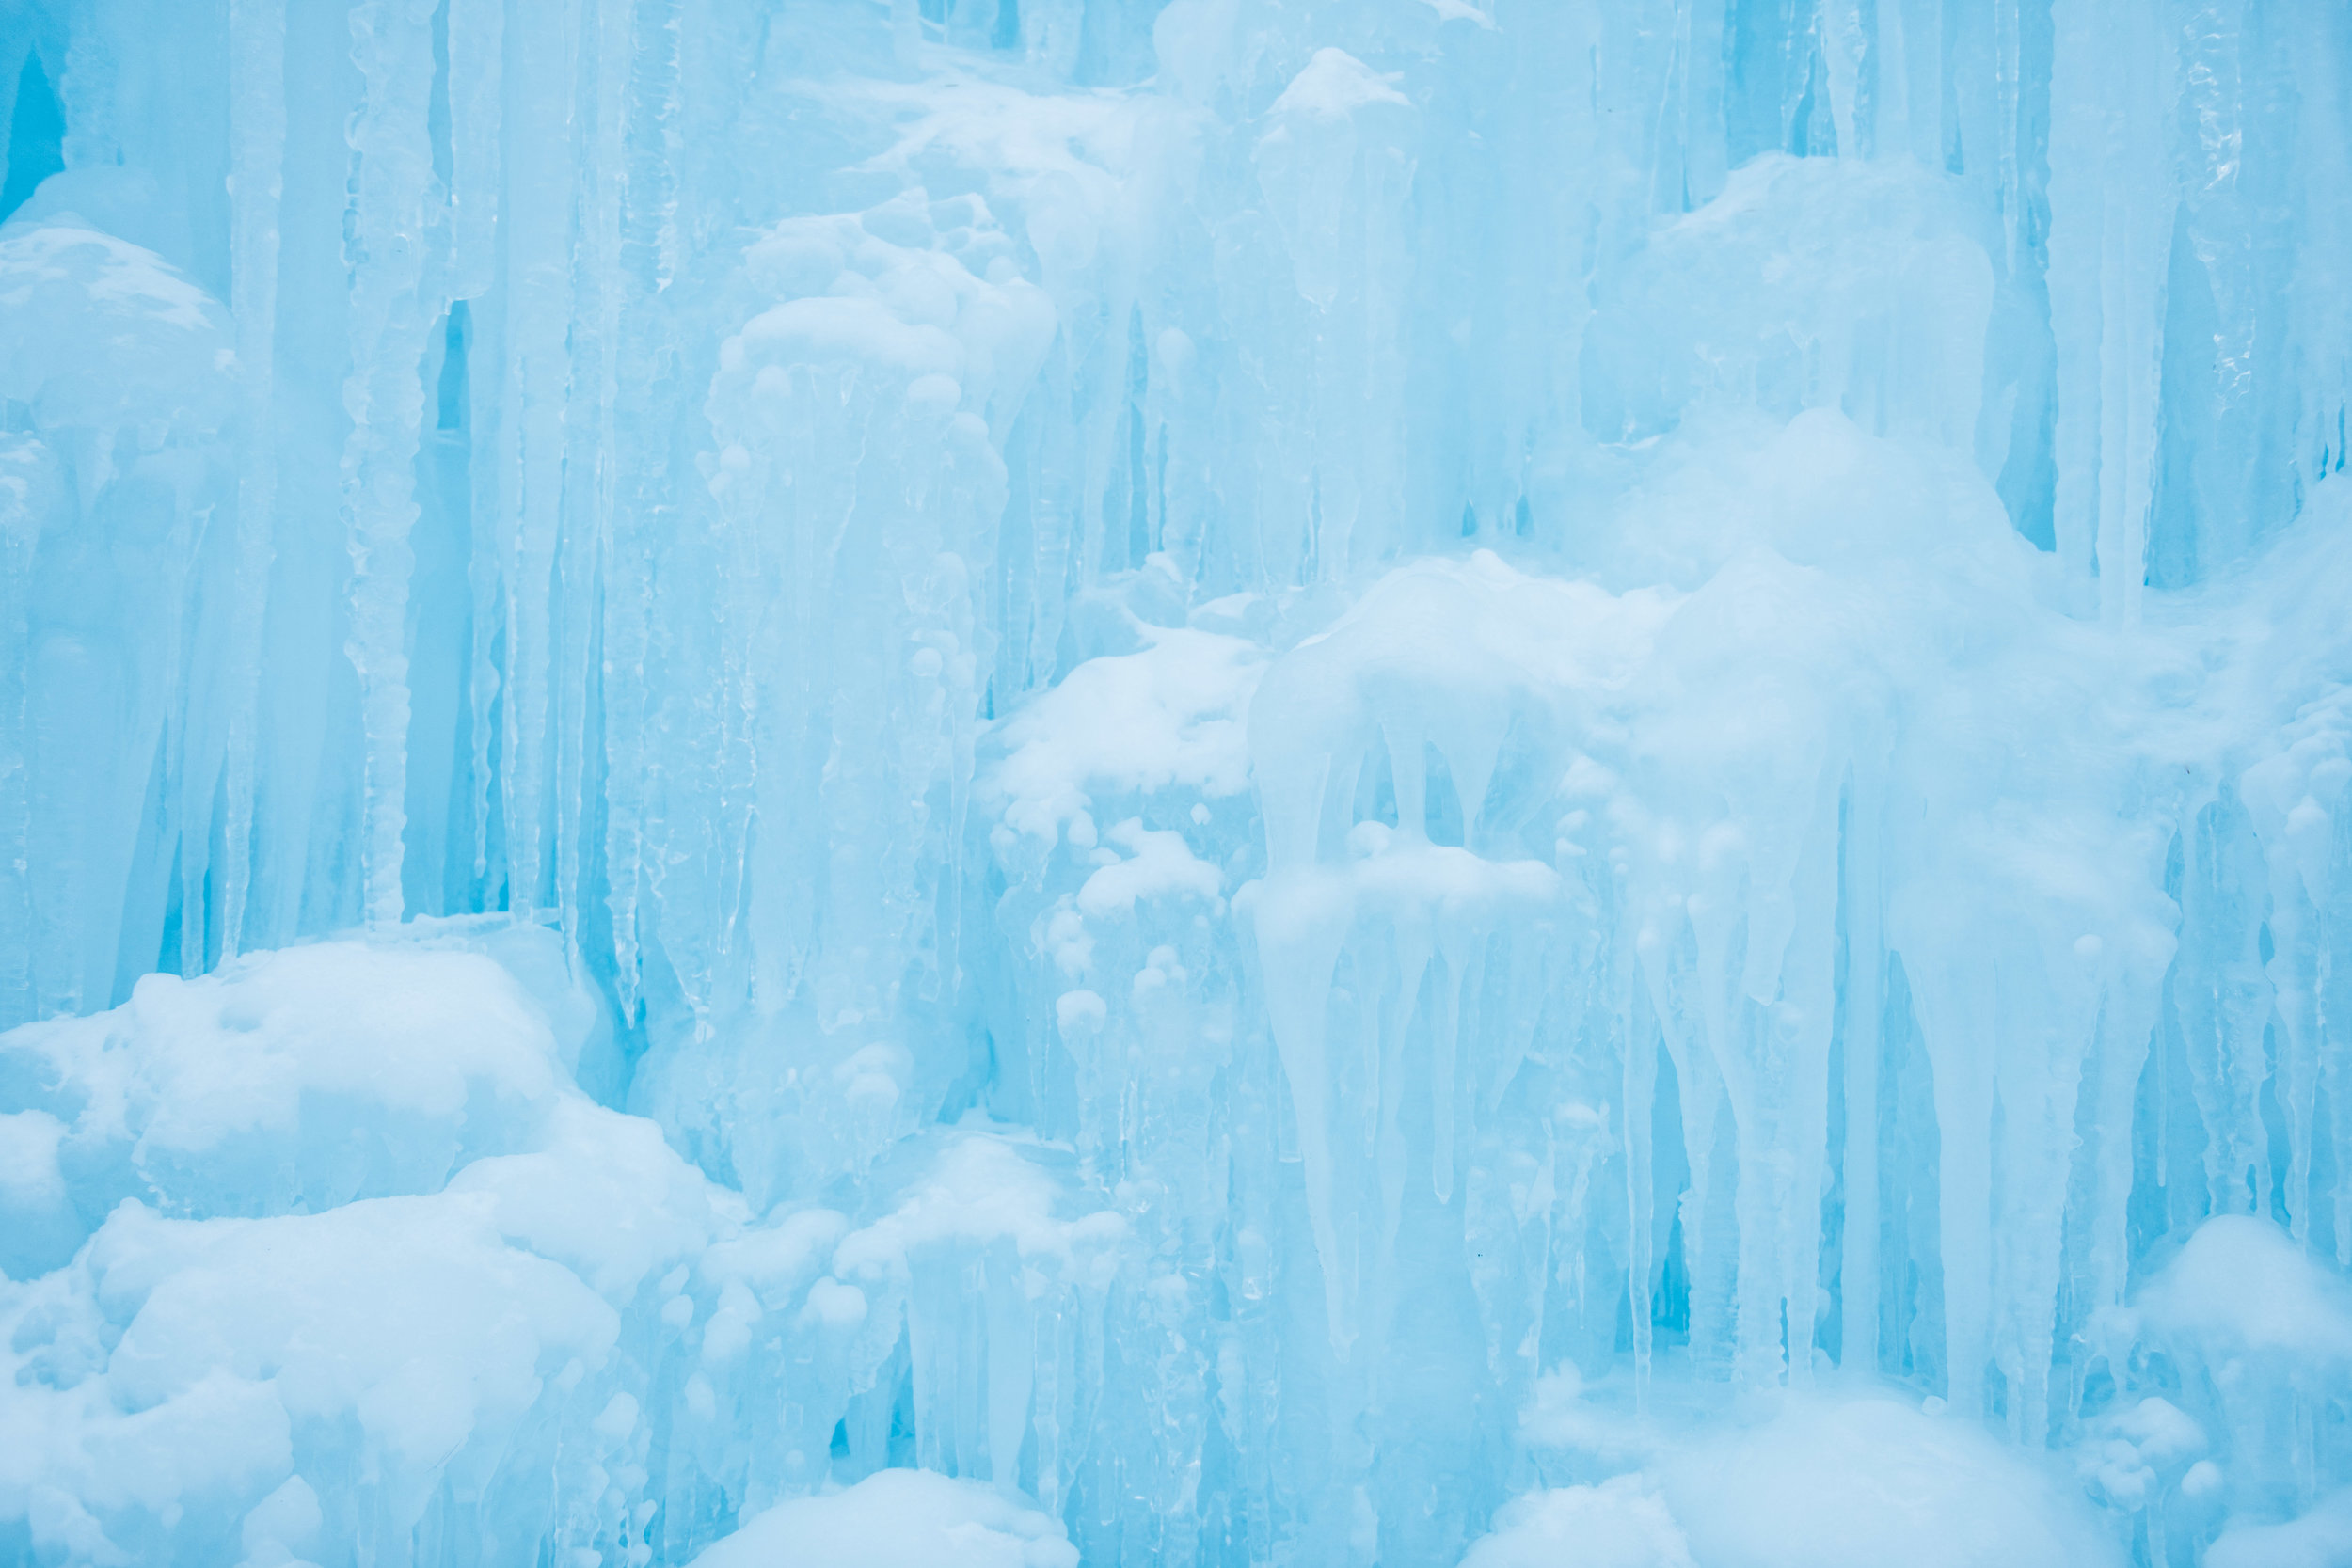 Ice Castles New Hampshire | Boston & New England Adventure Landscape Travel Photography